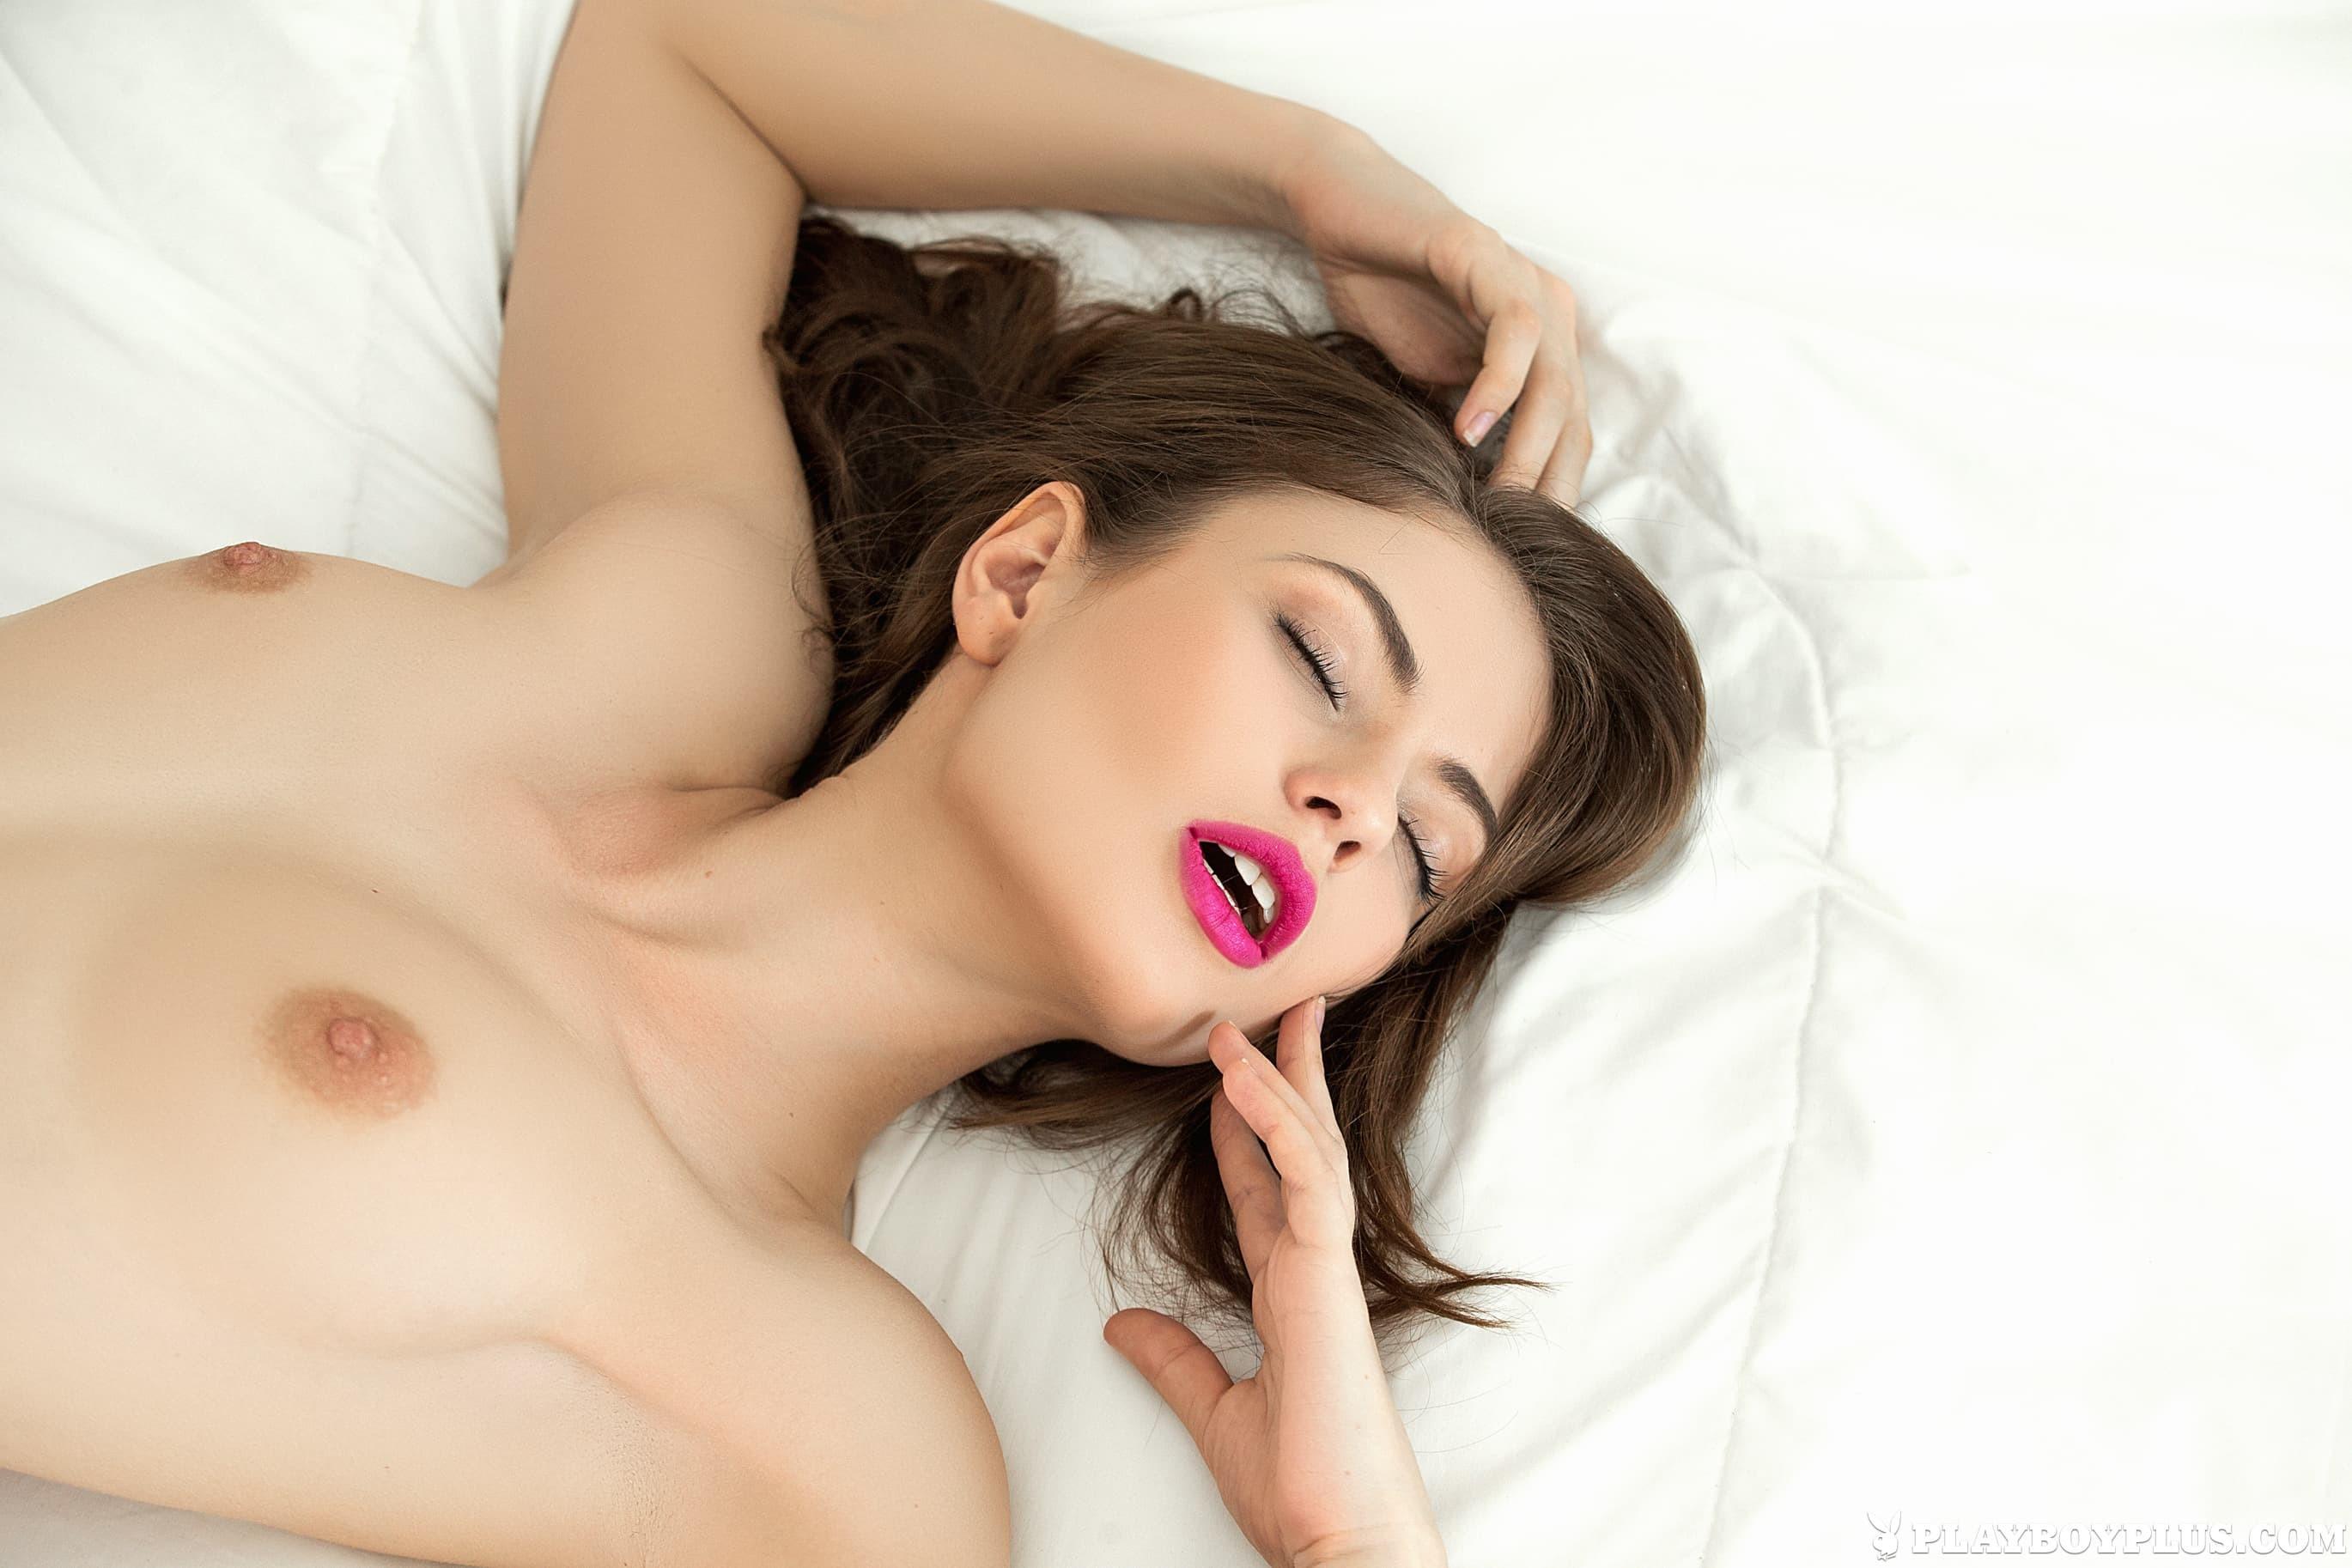 Девица в красивом нижнем белье на кровати - фото